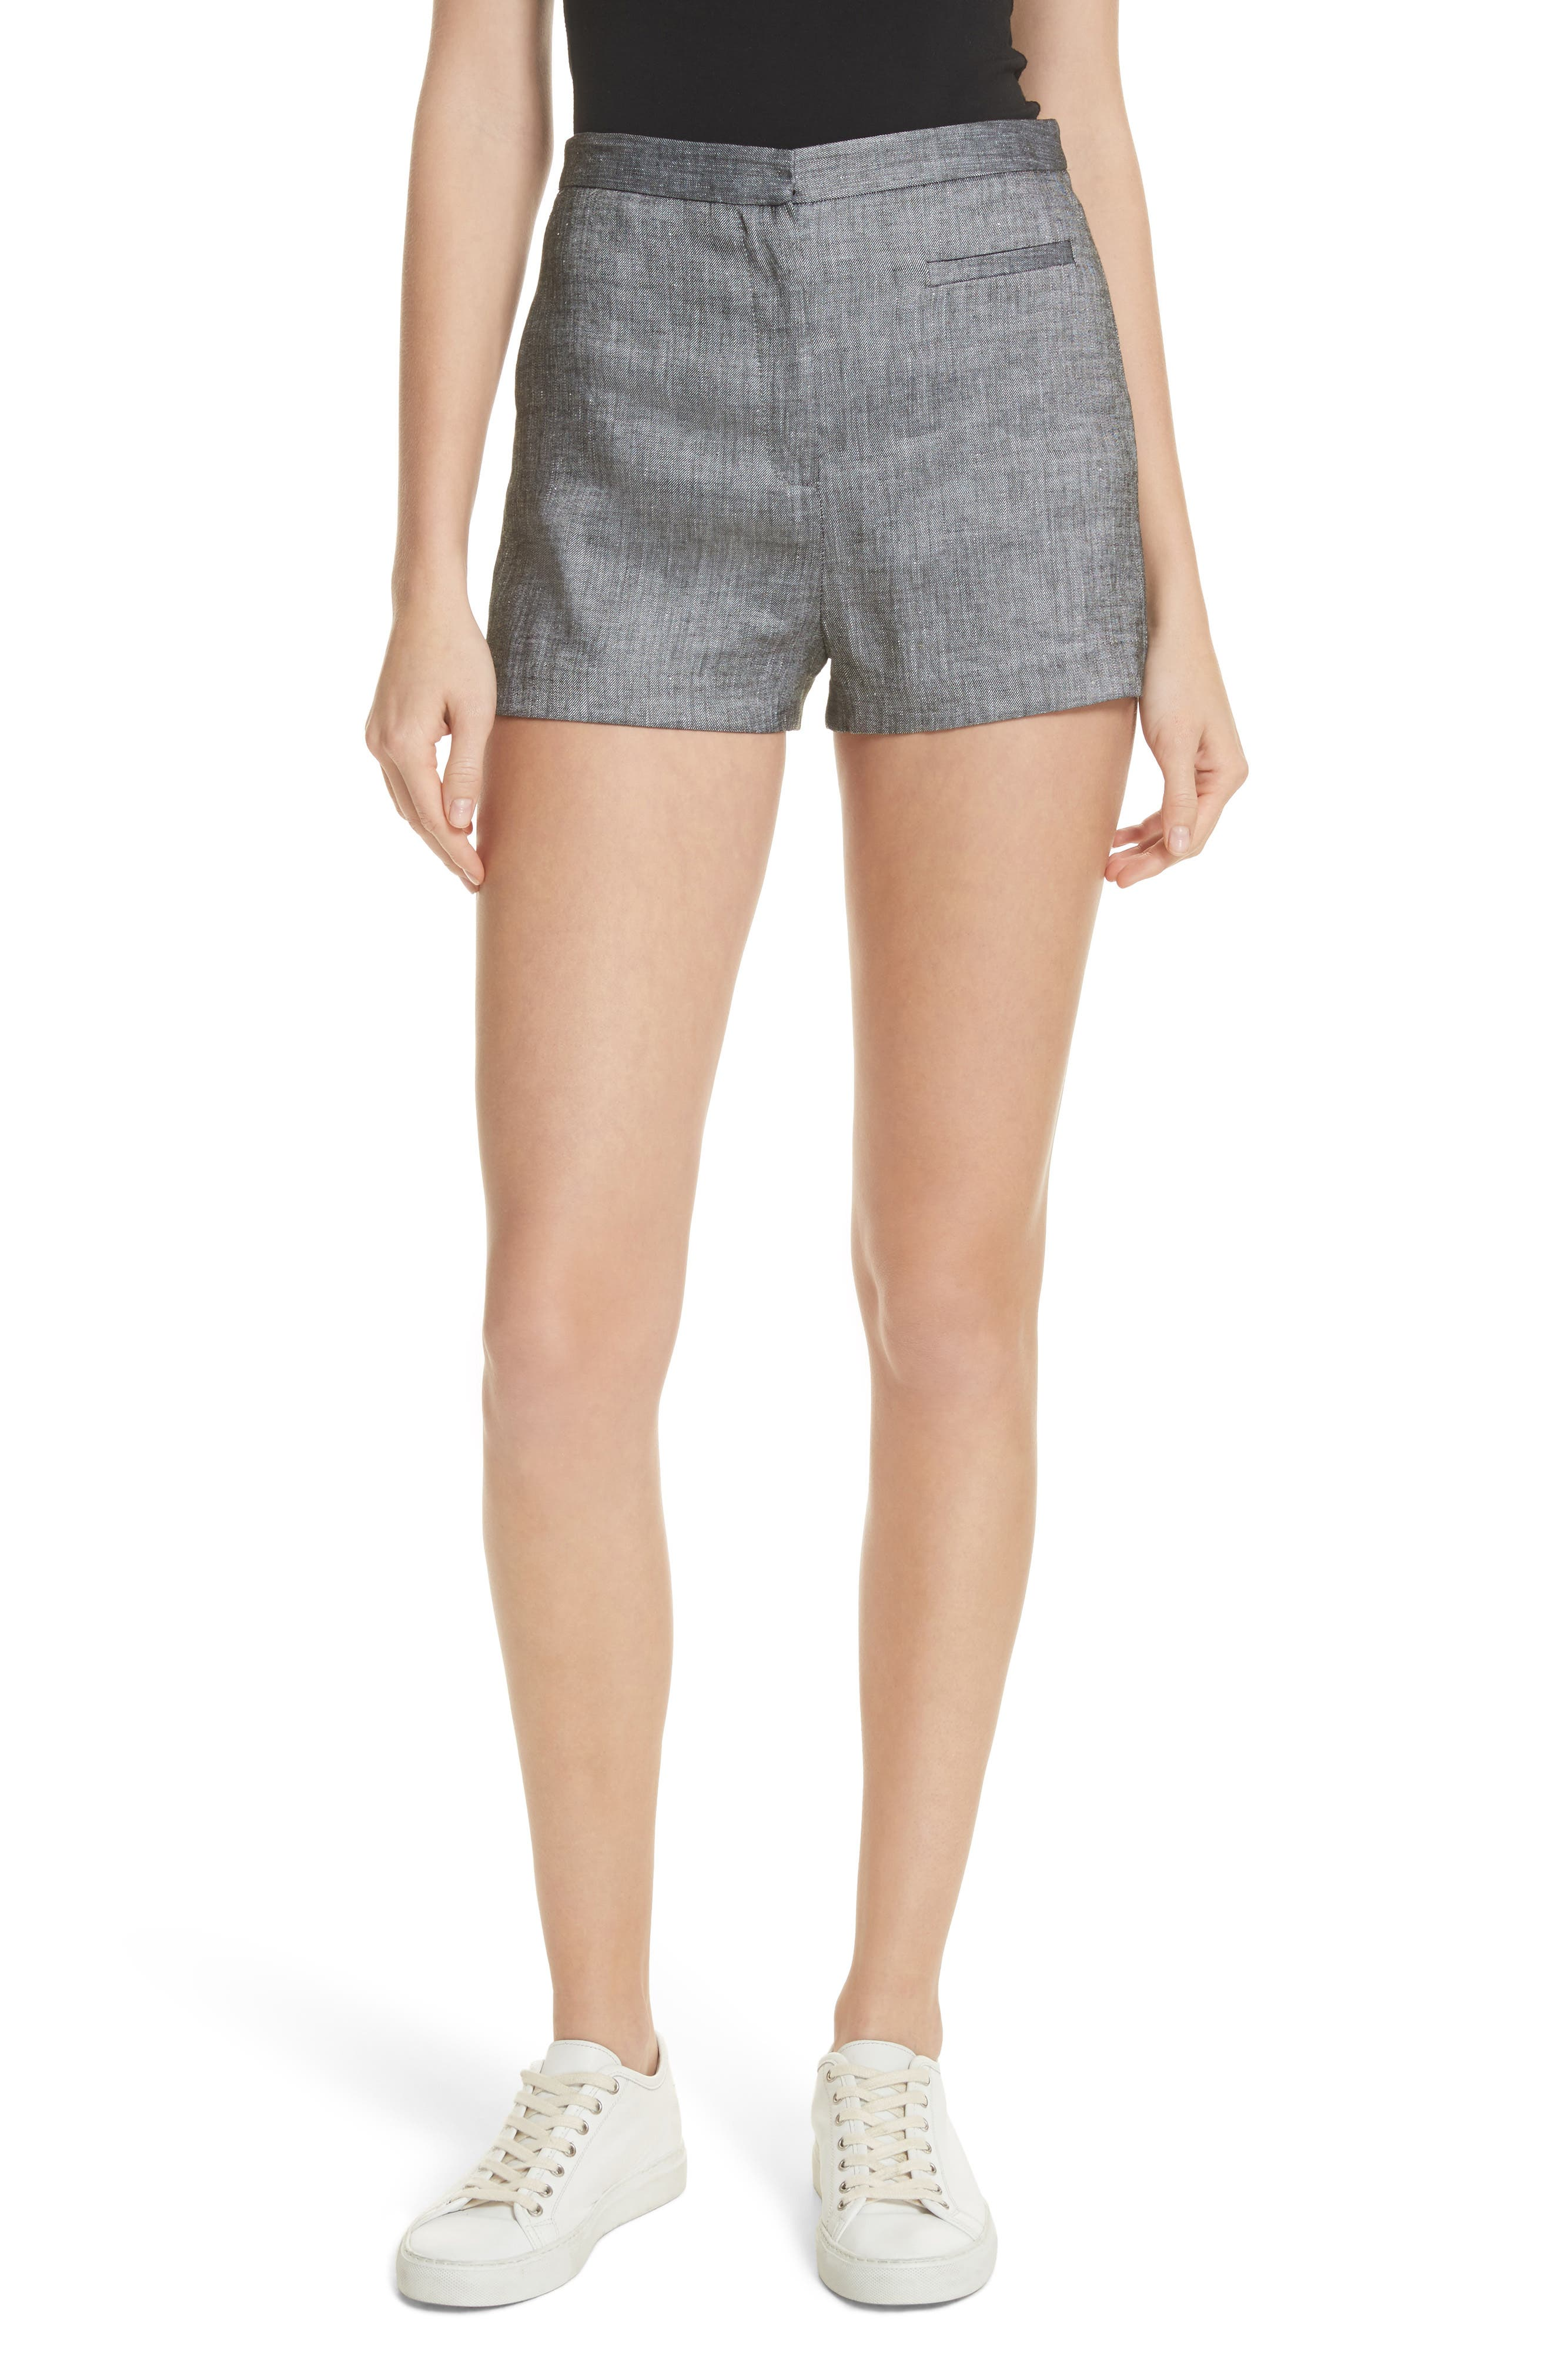 Trudee High Waist Shorts,                             Main thumbnail 1, color,                             Olive